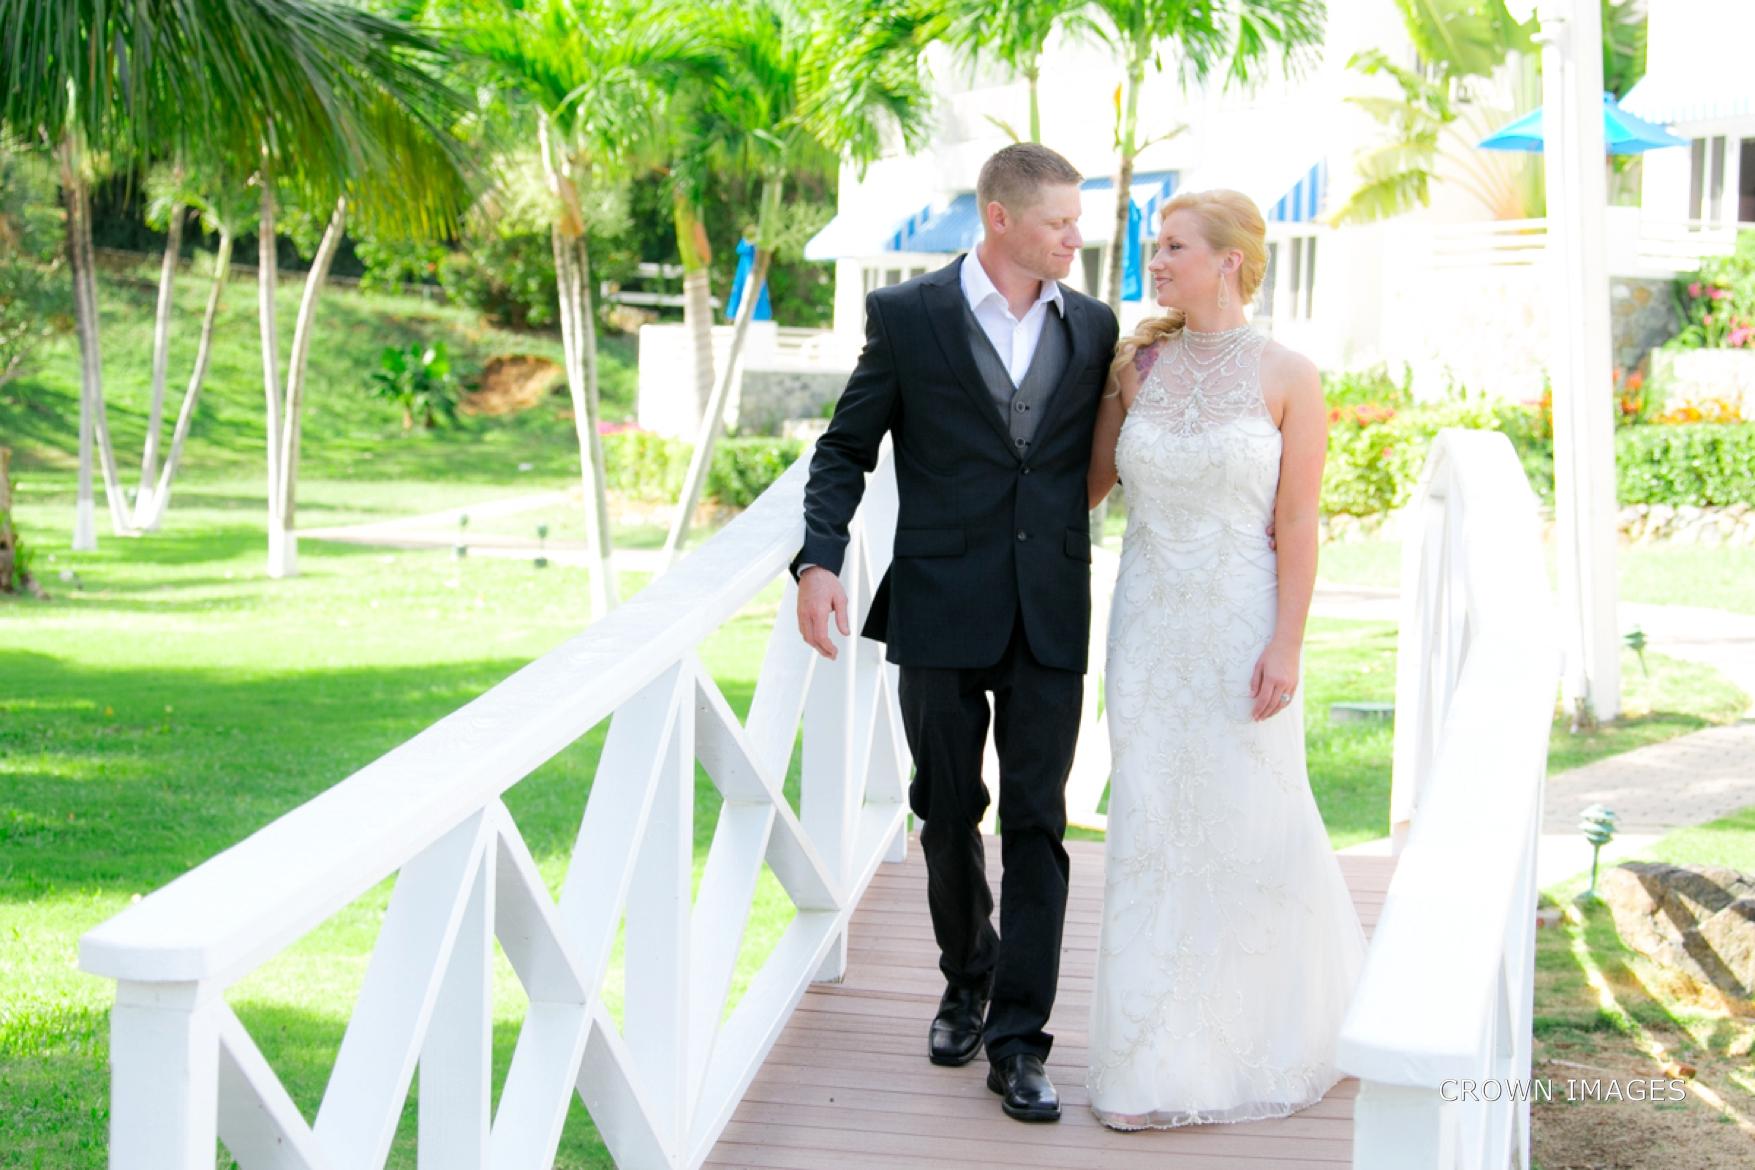 wedding_photos_saint_thomas_crown_images_0593.jpg